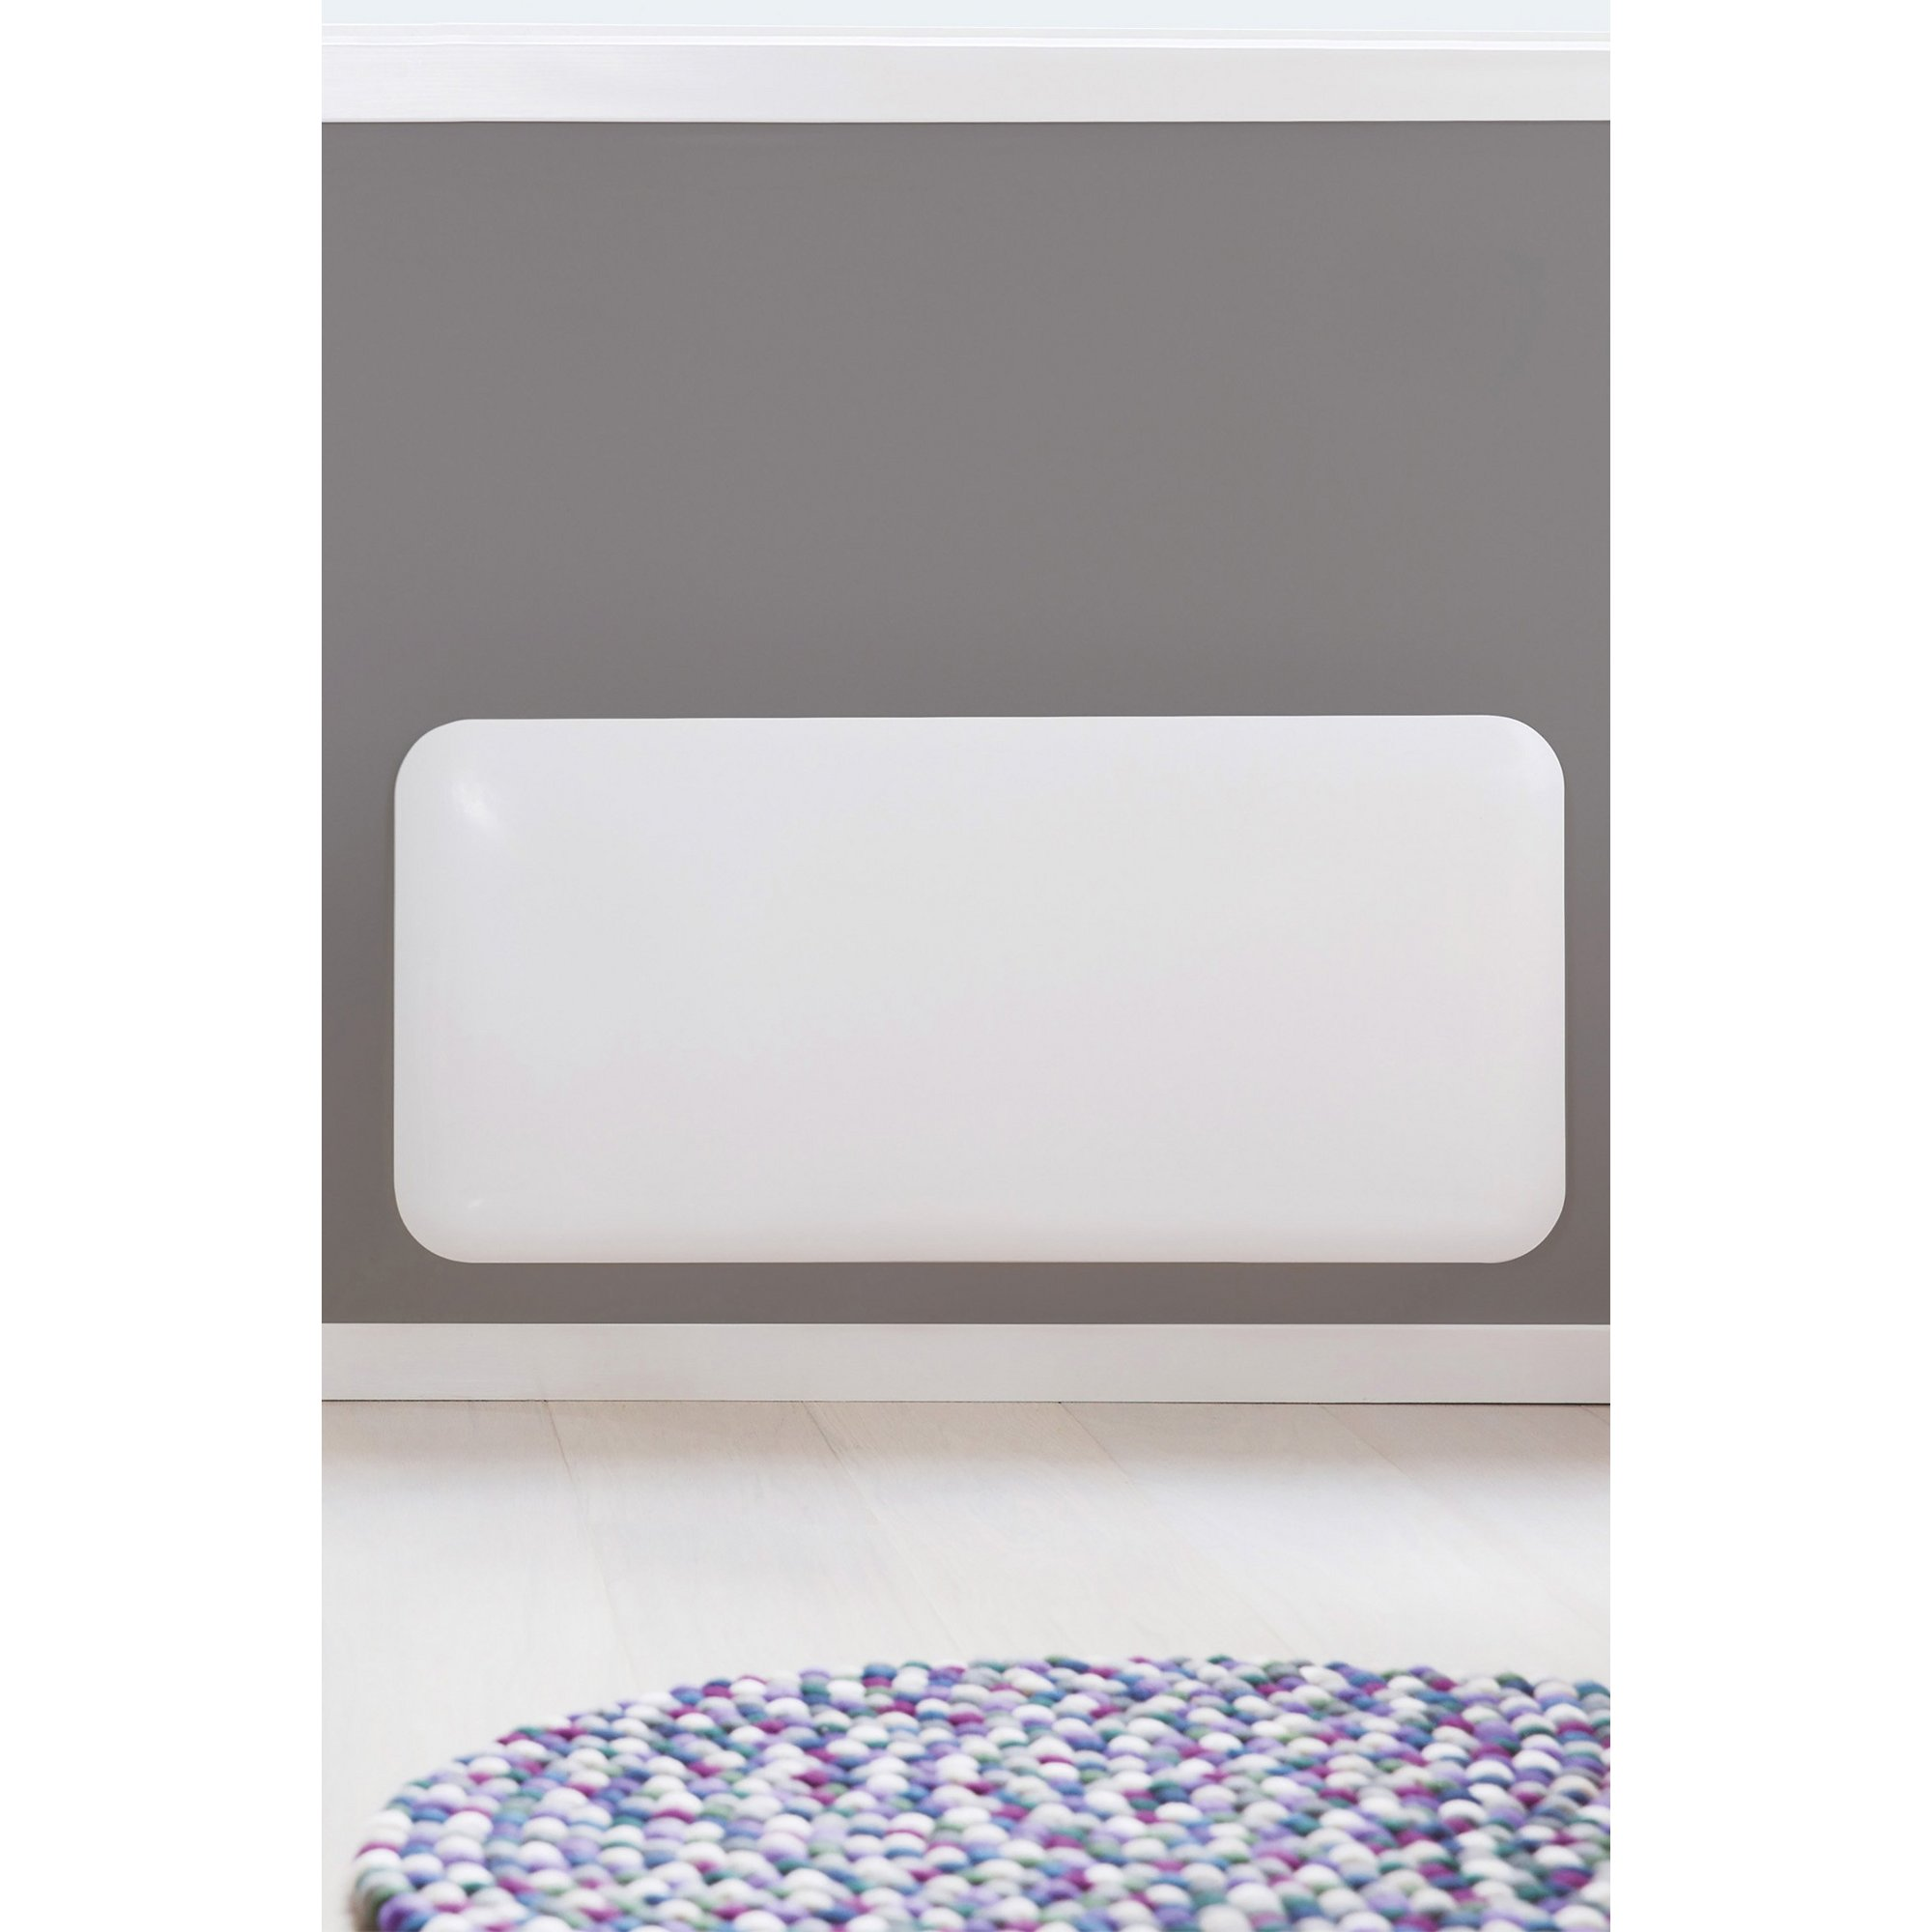 Image of Mill Heat 1500w Panel Heater